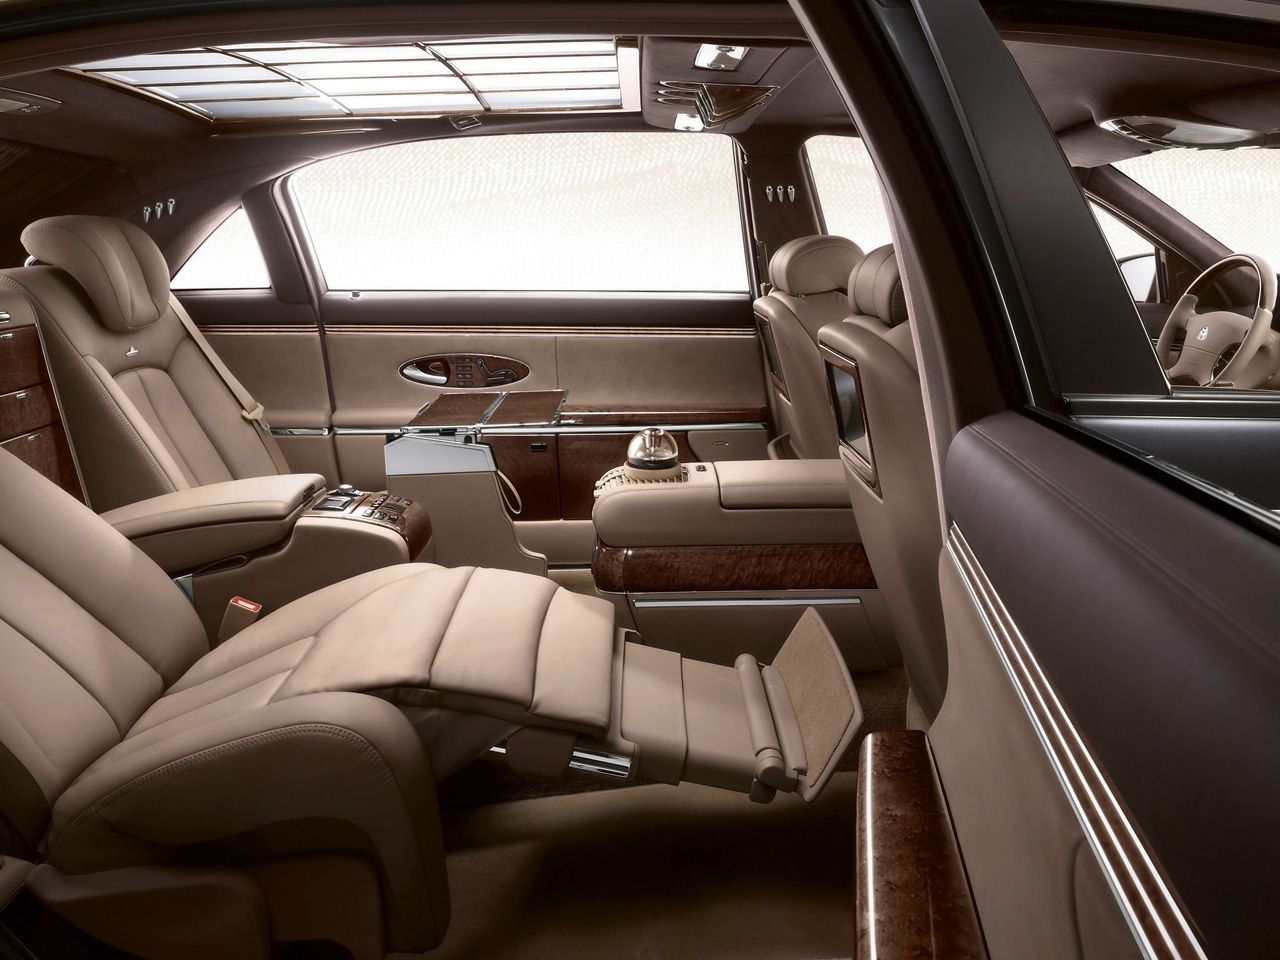 Maybach Luxury Car Interior Bing Images Luxury Car Interior Luxury Cars Maybach